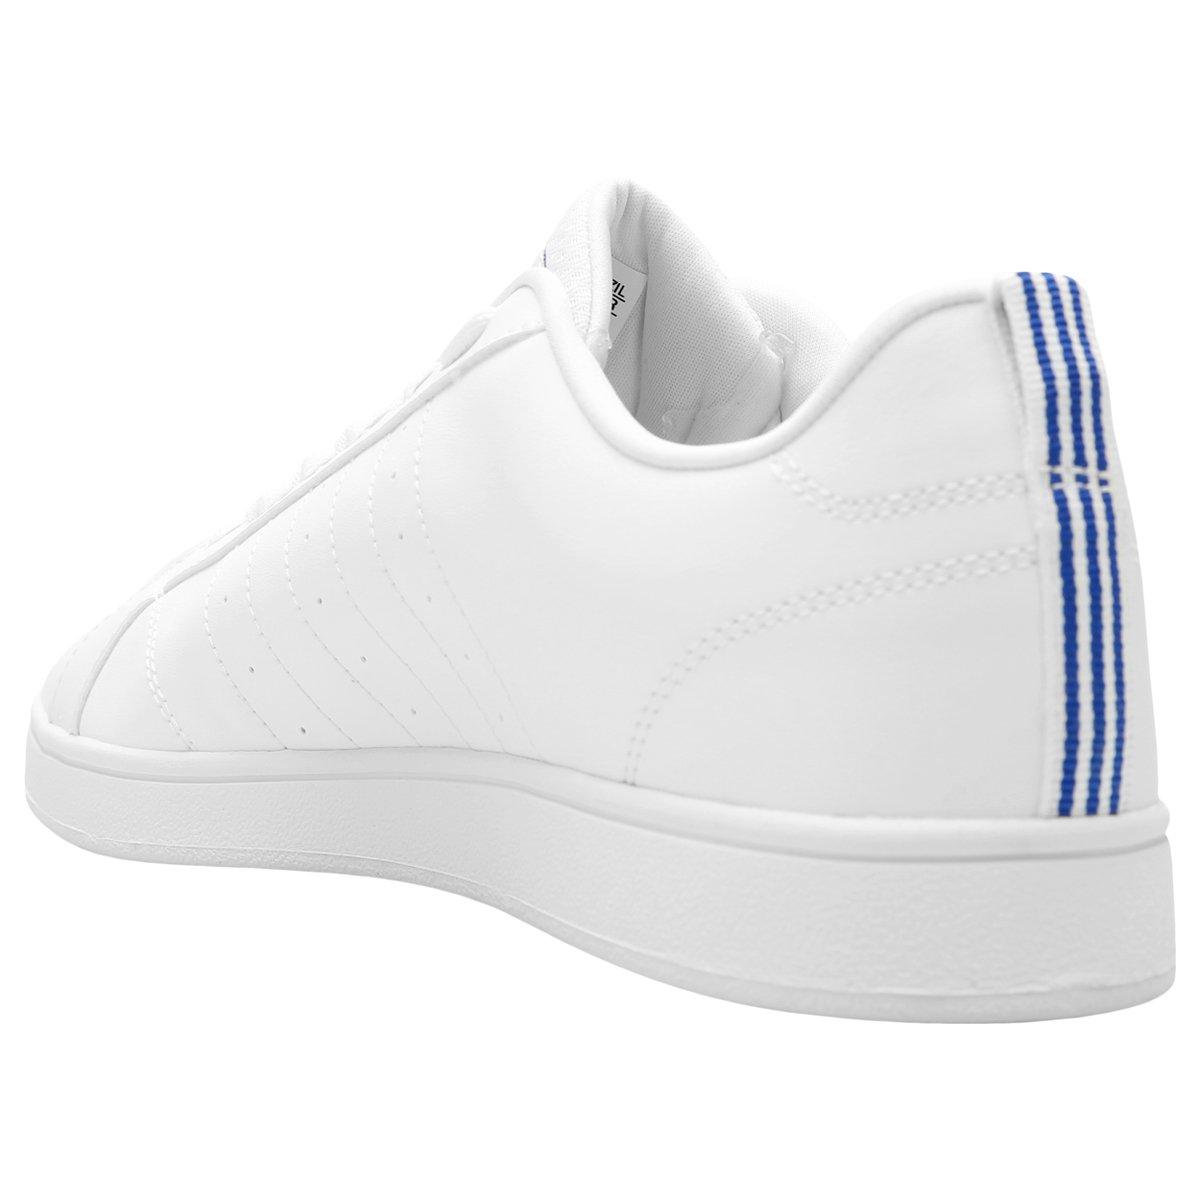 Tênis Adidas Advantage Vs - Branco - Compre Agora  c80931763ec67